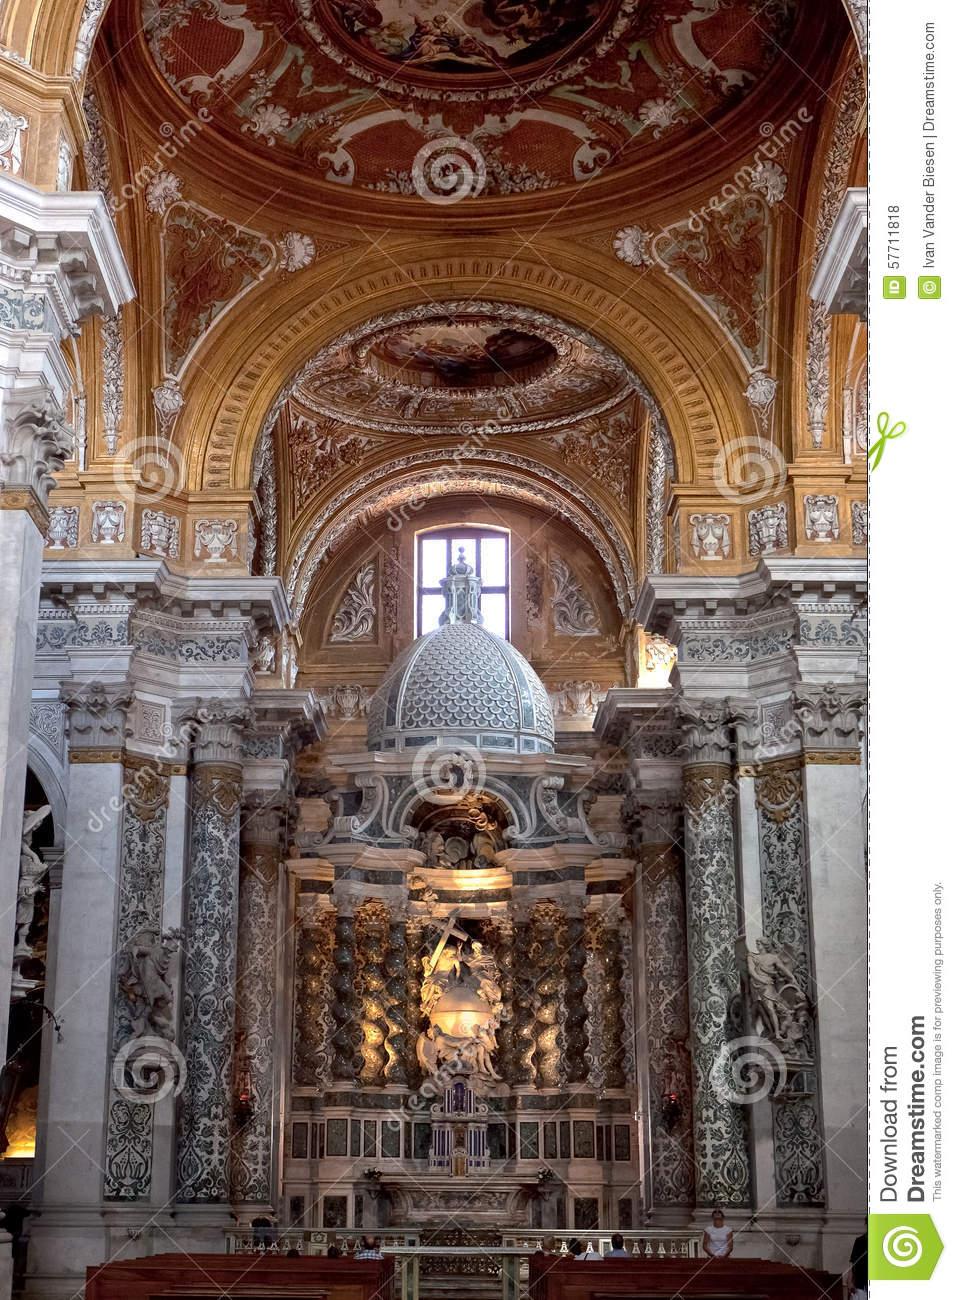 Altar Santa Maria Assunta, I Gesuiti, Venice, Italy Stock Photo.